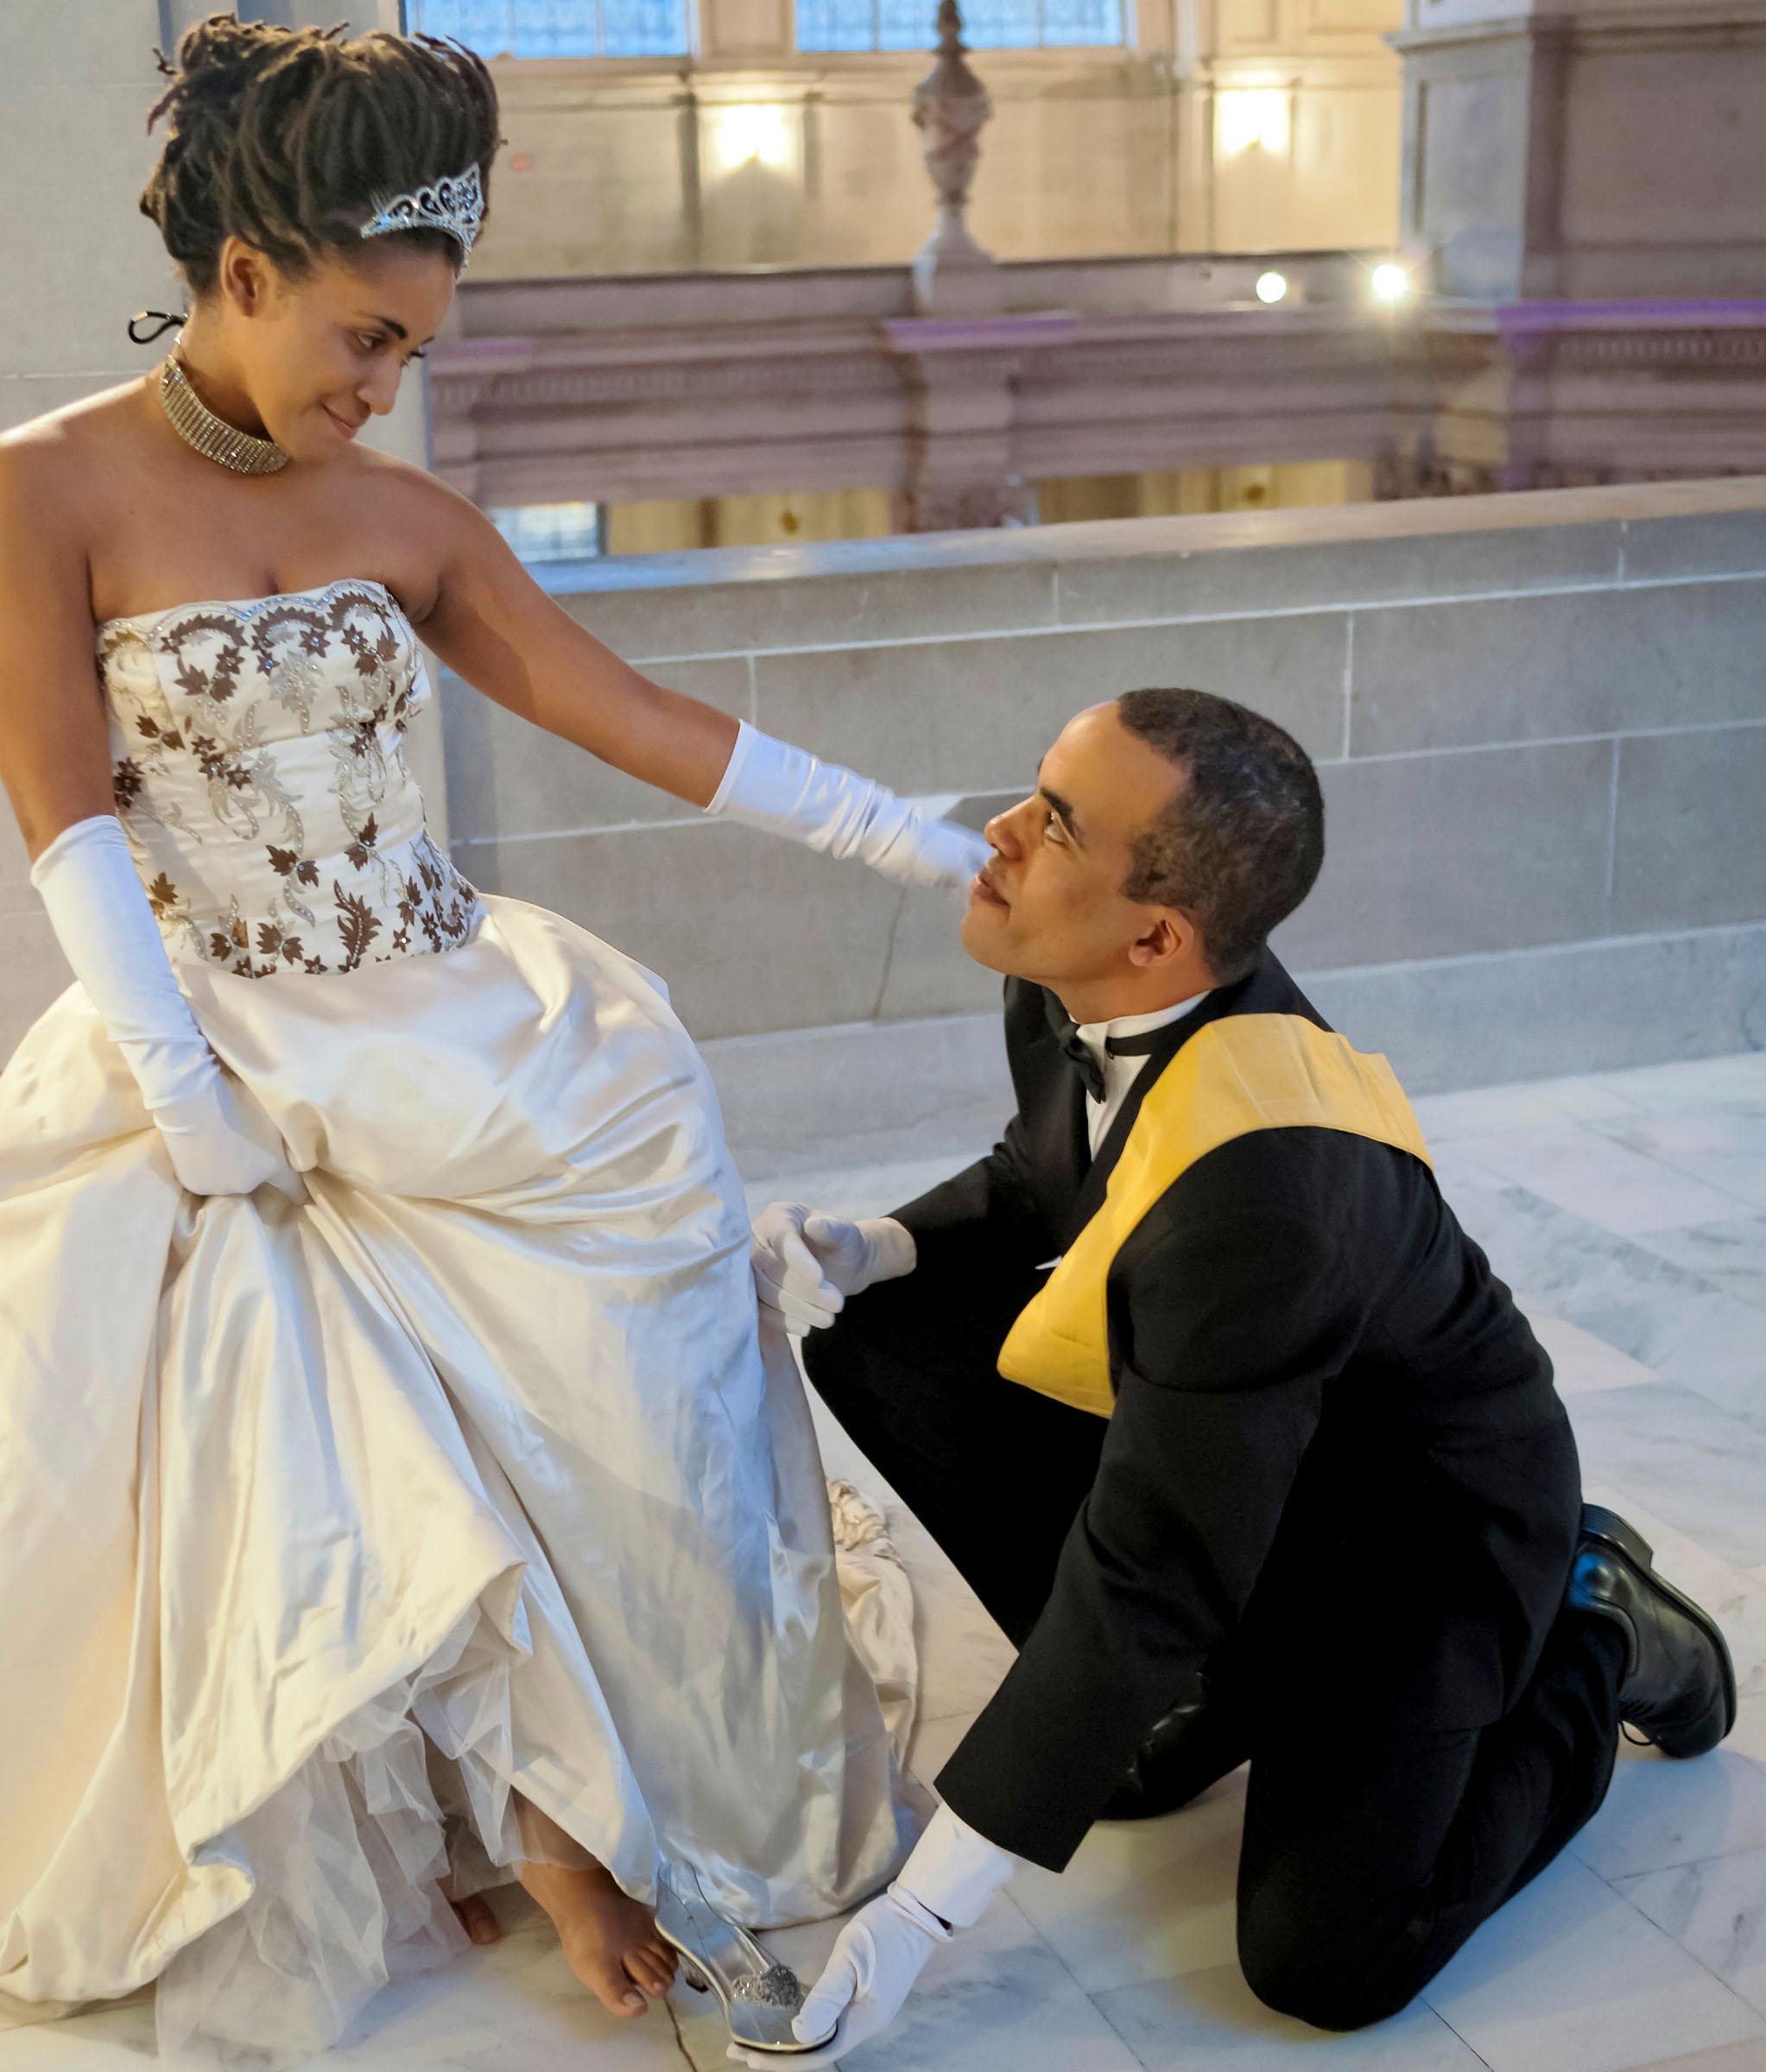 https://i1.wp.com/www.african-americanshakes.org/Assets/PressPhotos/Cinderella_2011/Cinderella11-42.jpg